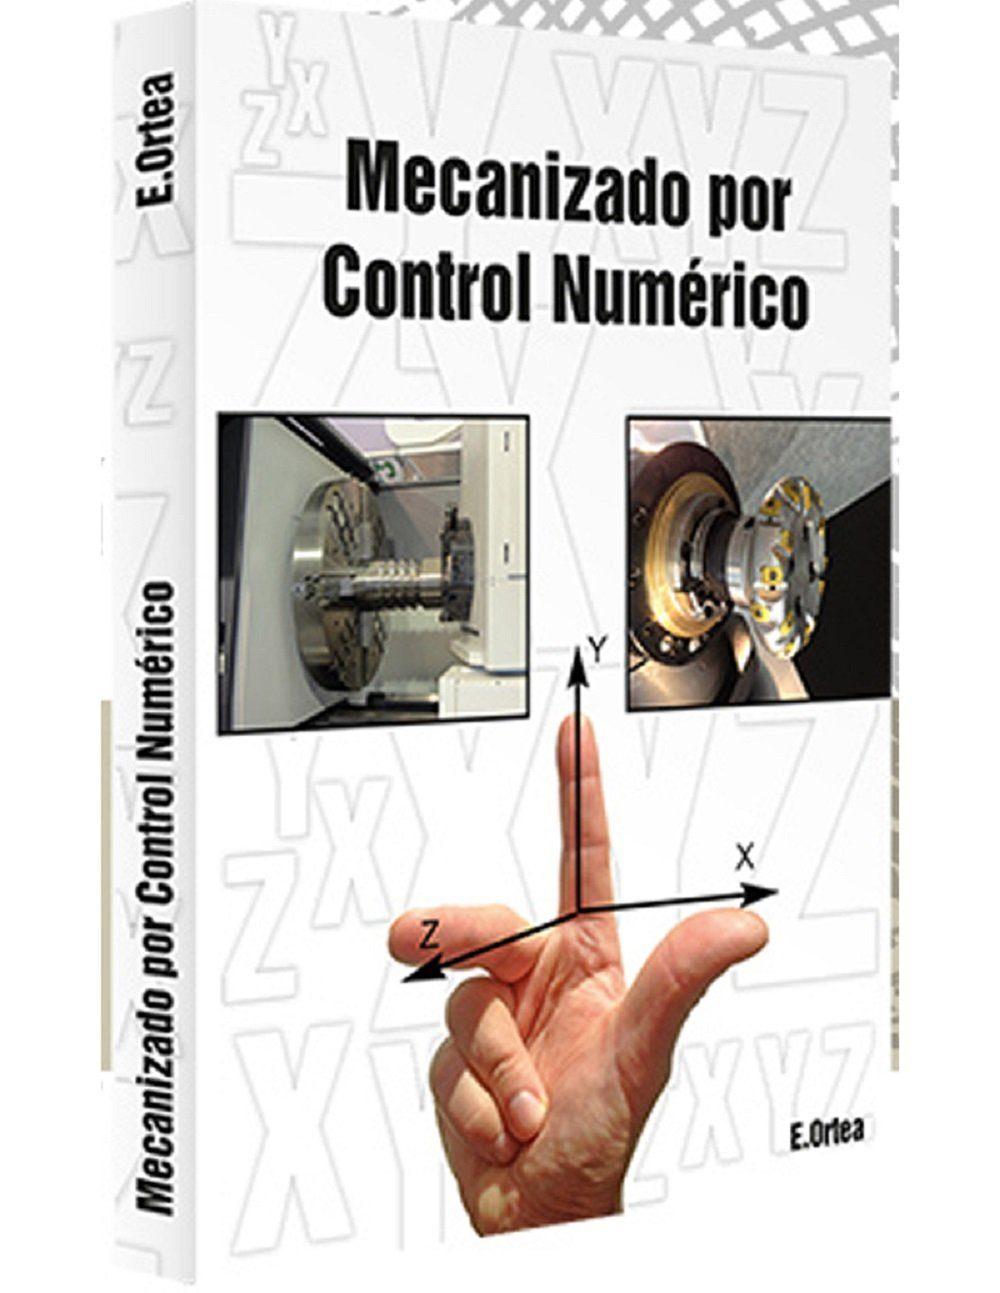 Mecanizado Por Control Numérico por Enrique Ortea Varela